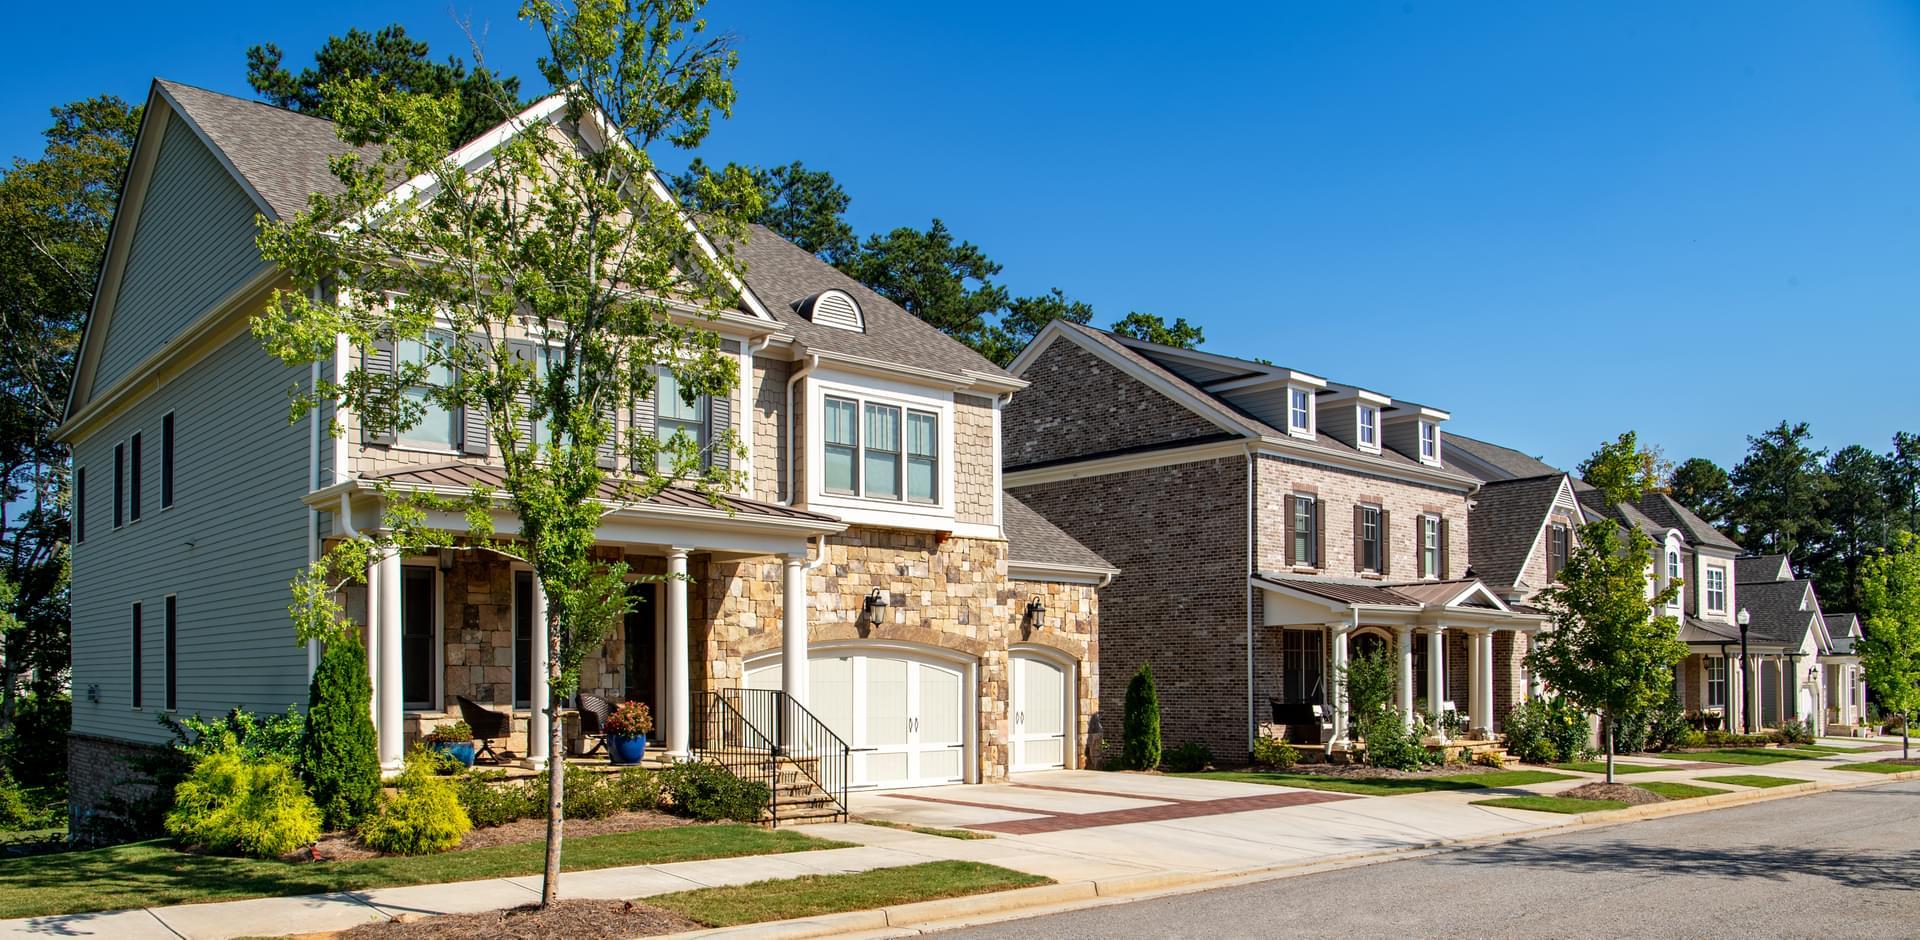 Bellmoore Park New Homes in Johns Creek GA